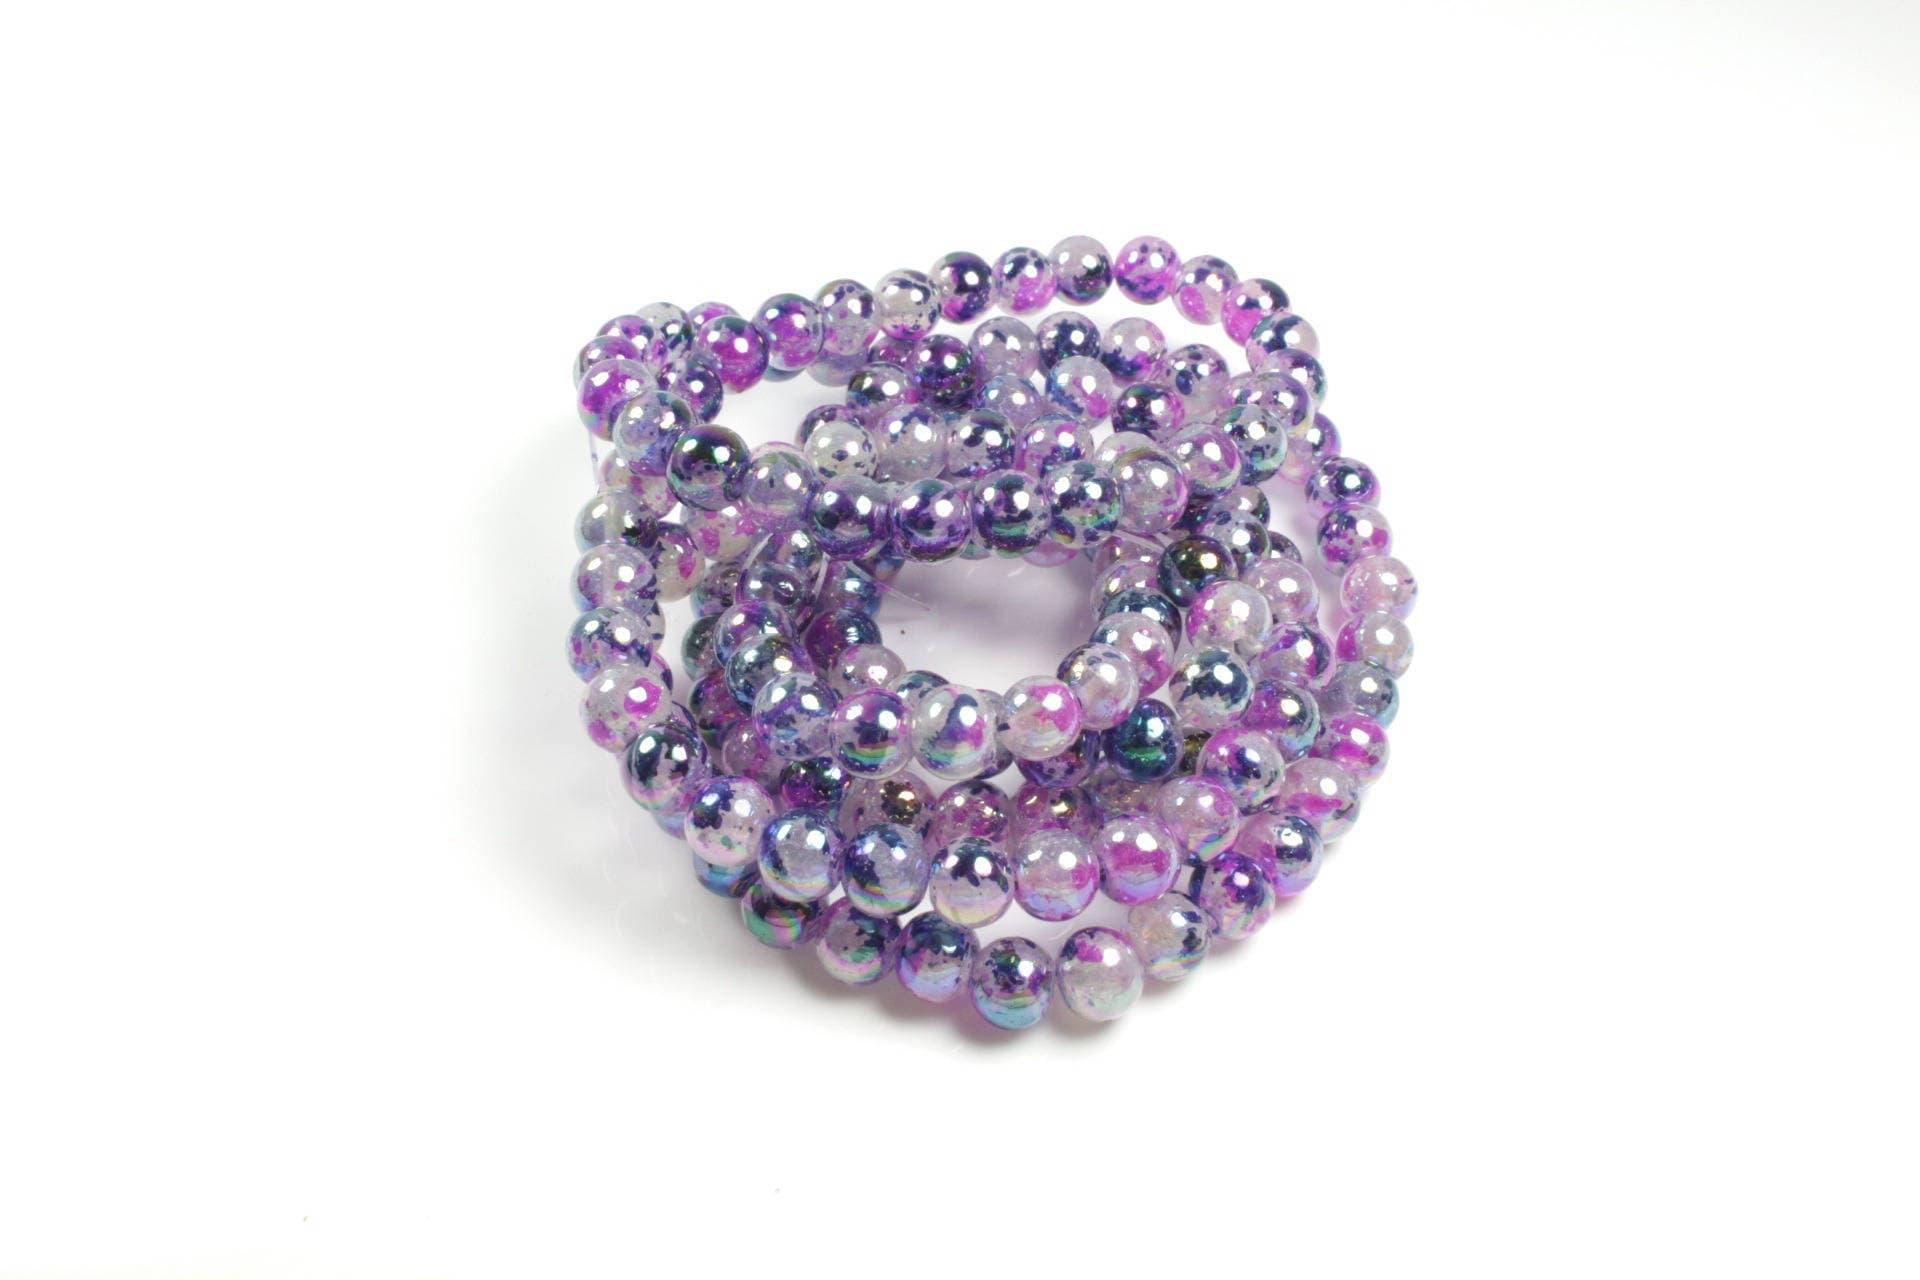 150 perles en verre tachet nuances de bleu violet etsy. Black Bedroom Furniture Sets. Home Design Ideas